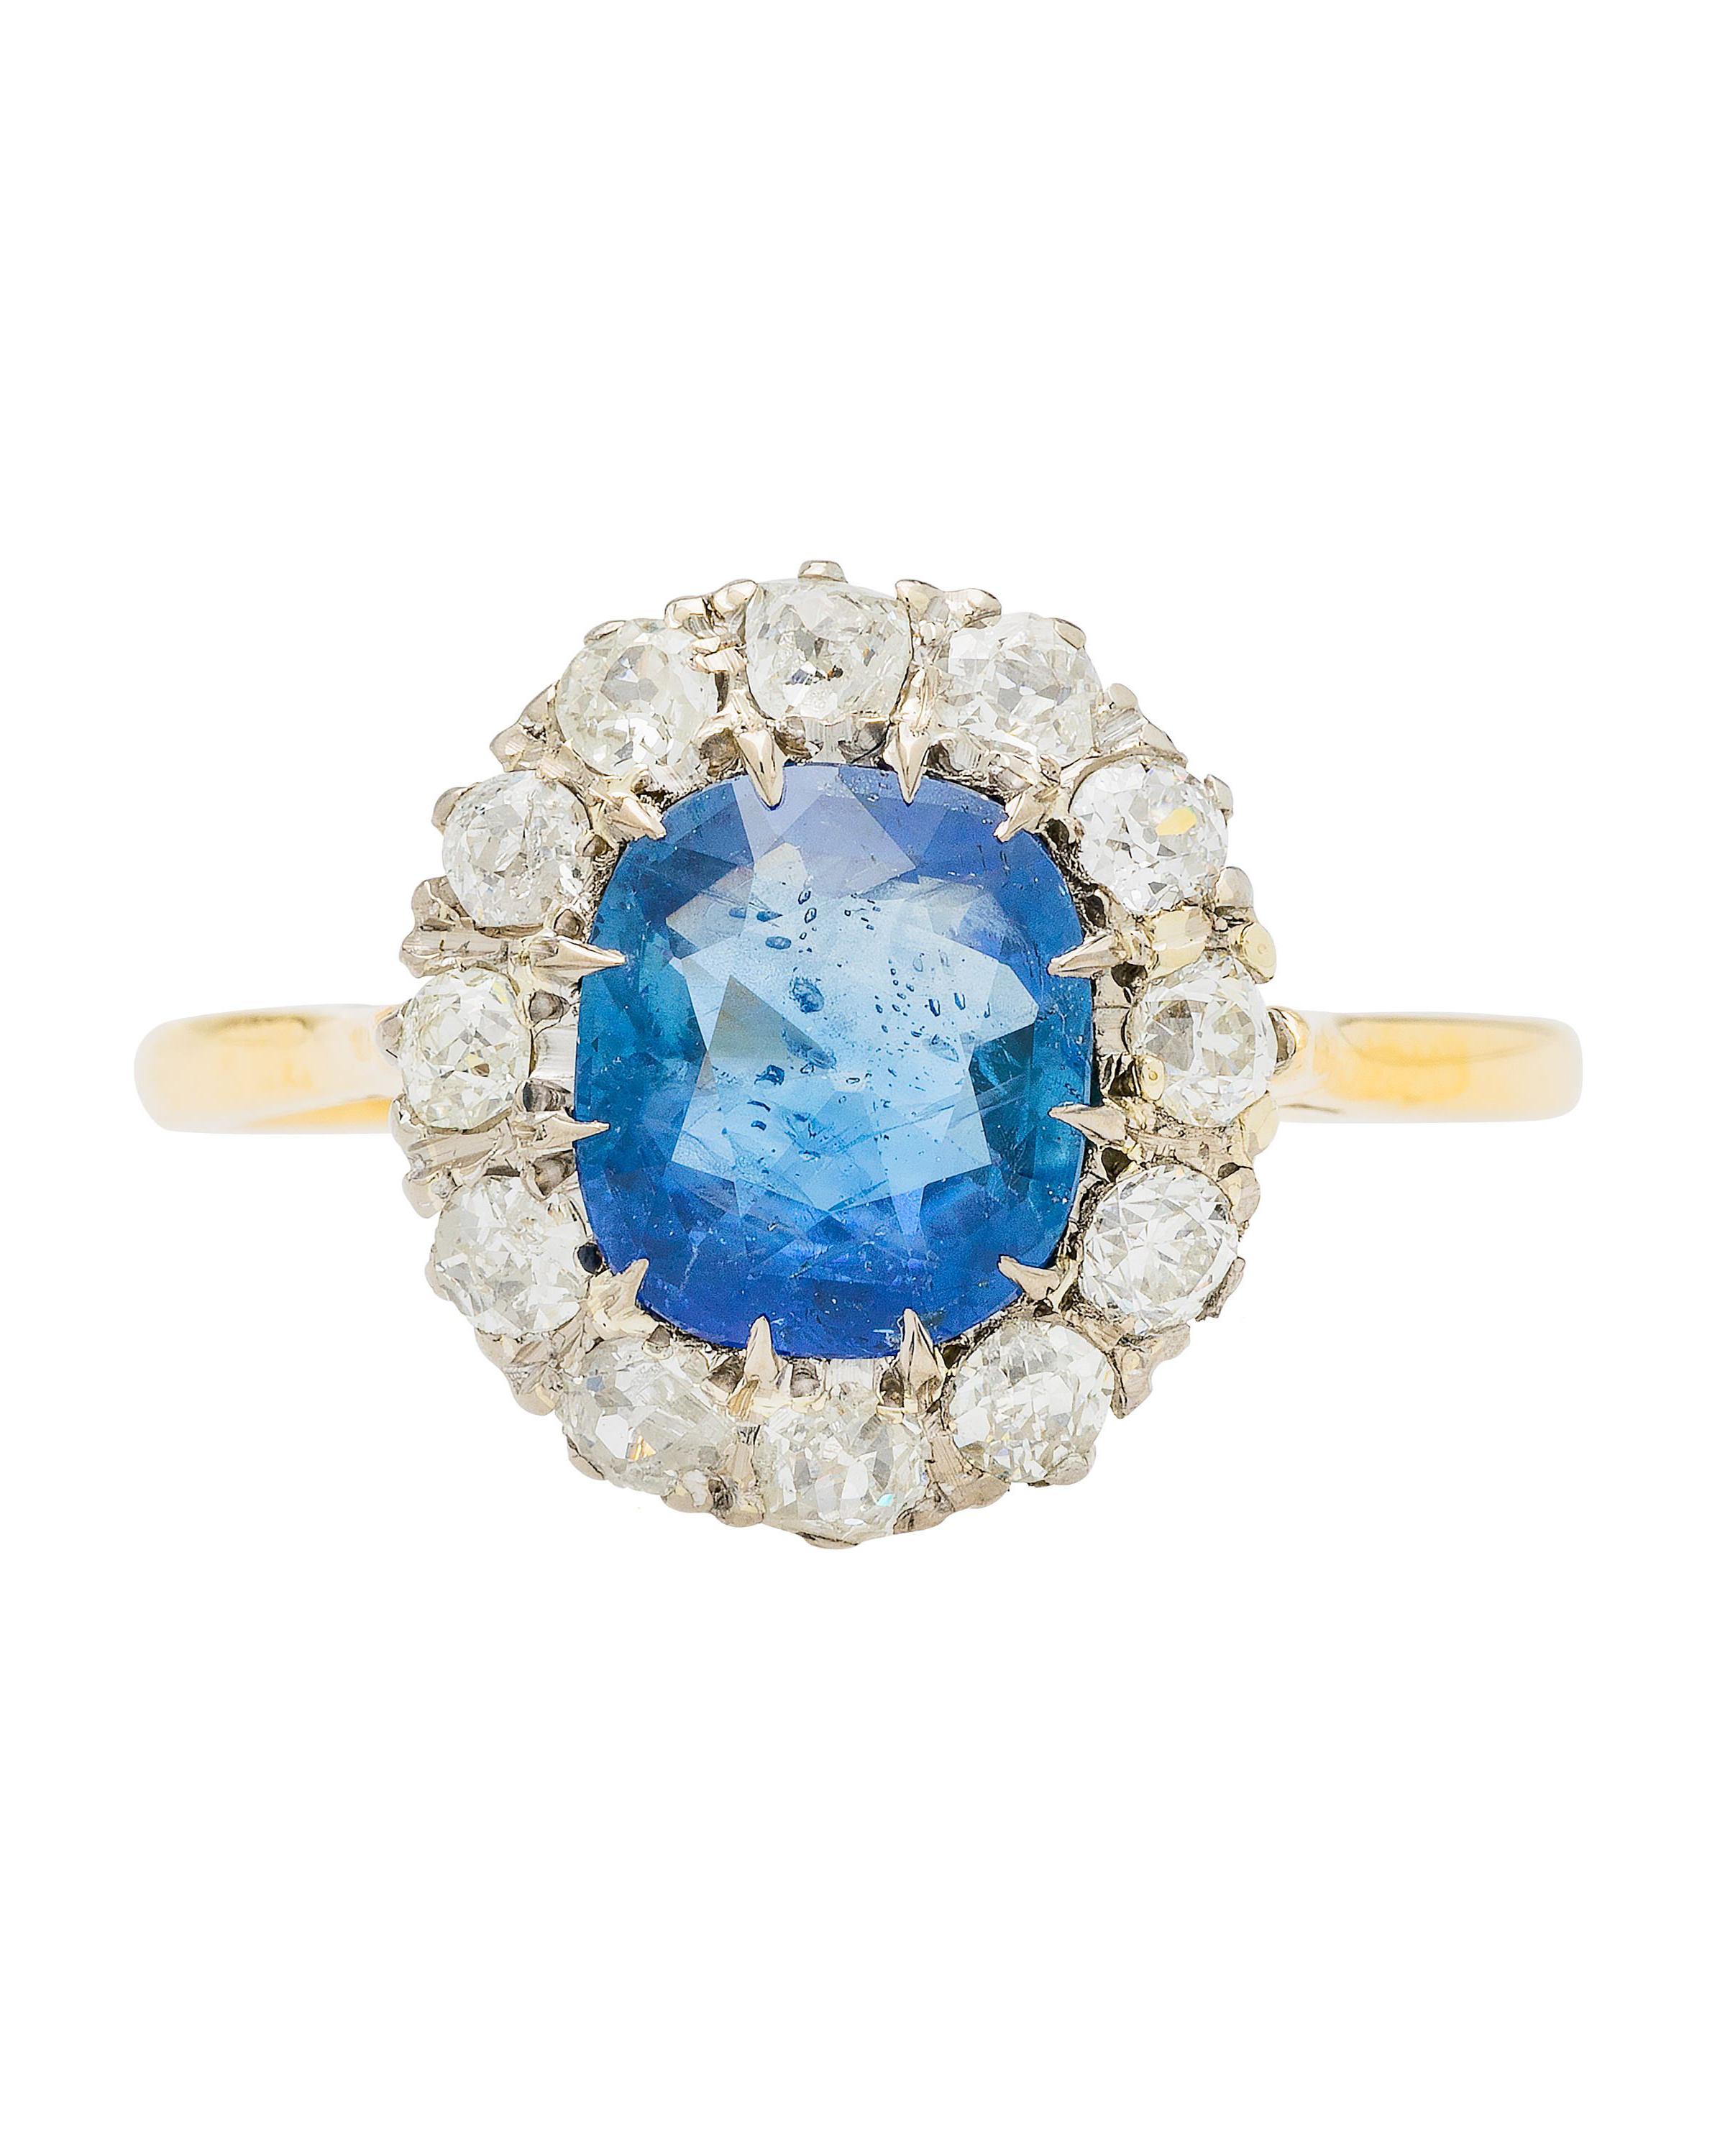 Victorian era yellow gold platinum sapphire center engagement ring